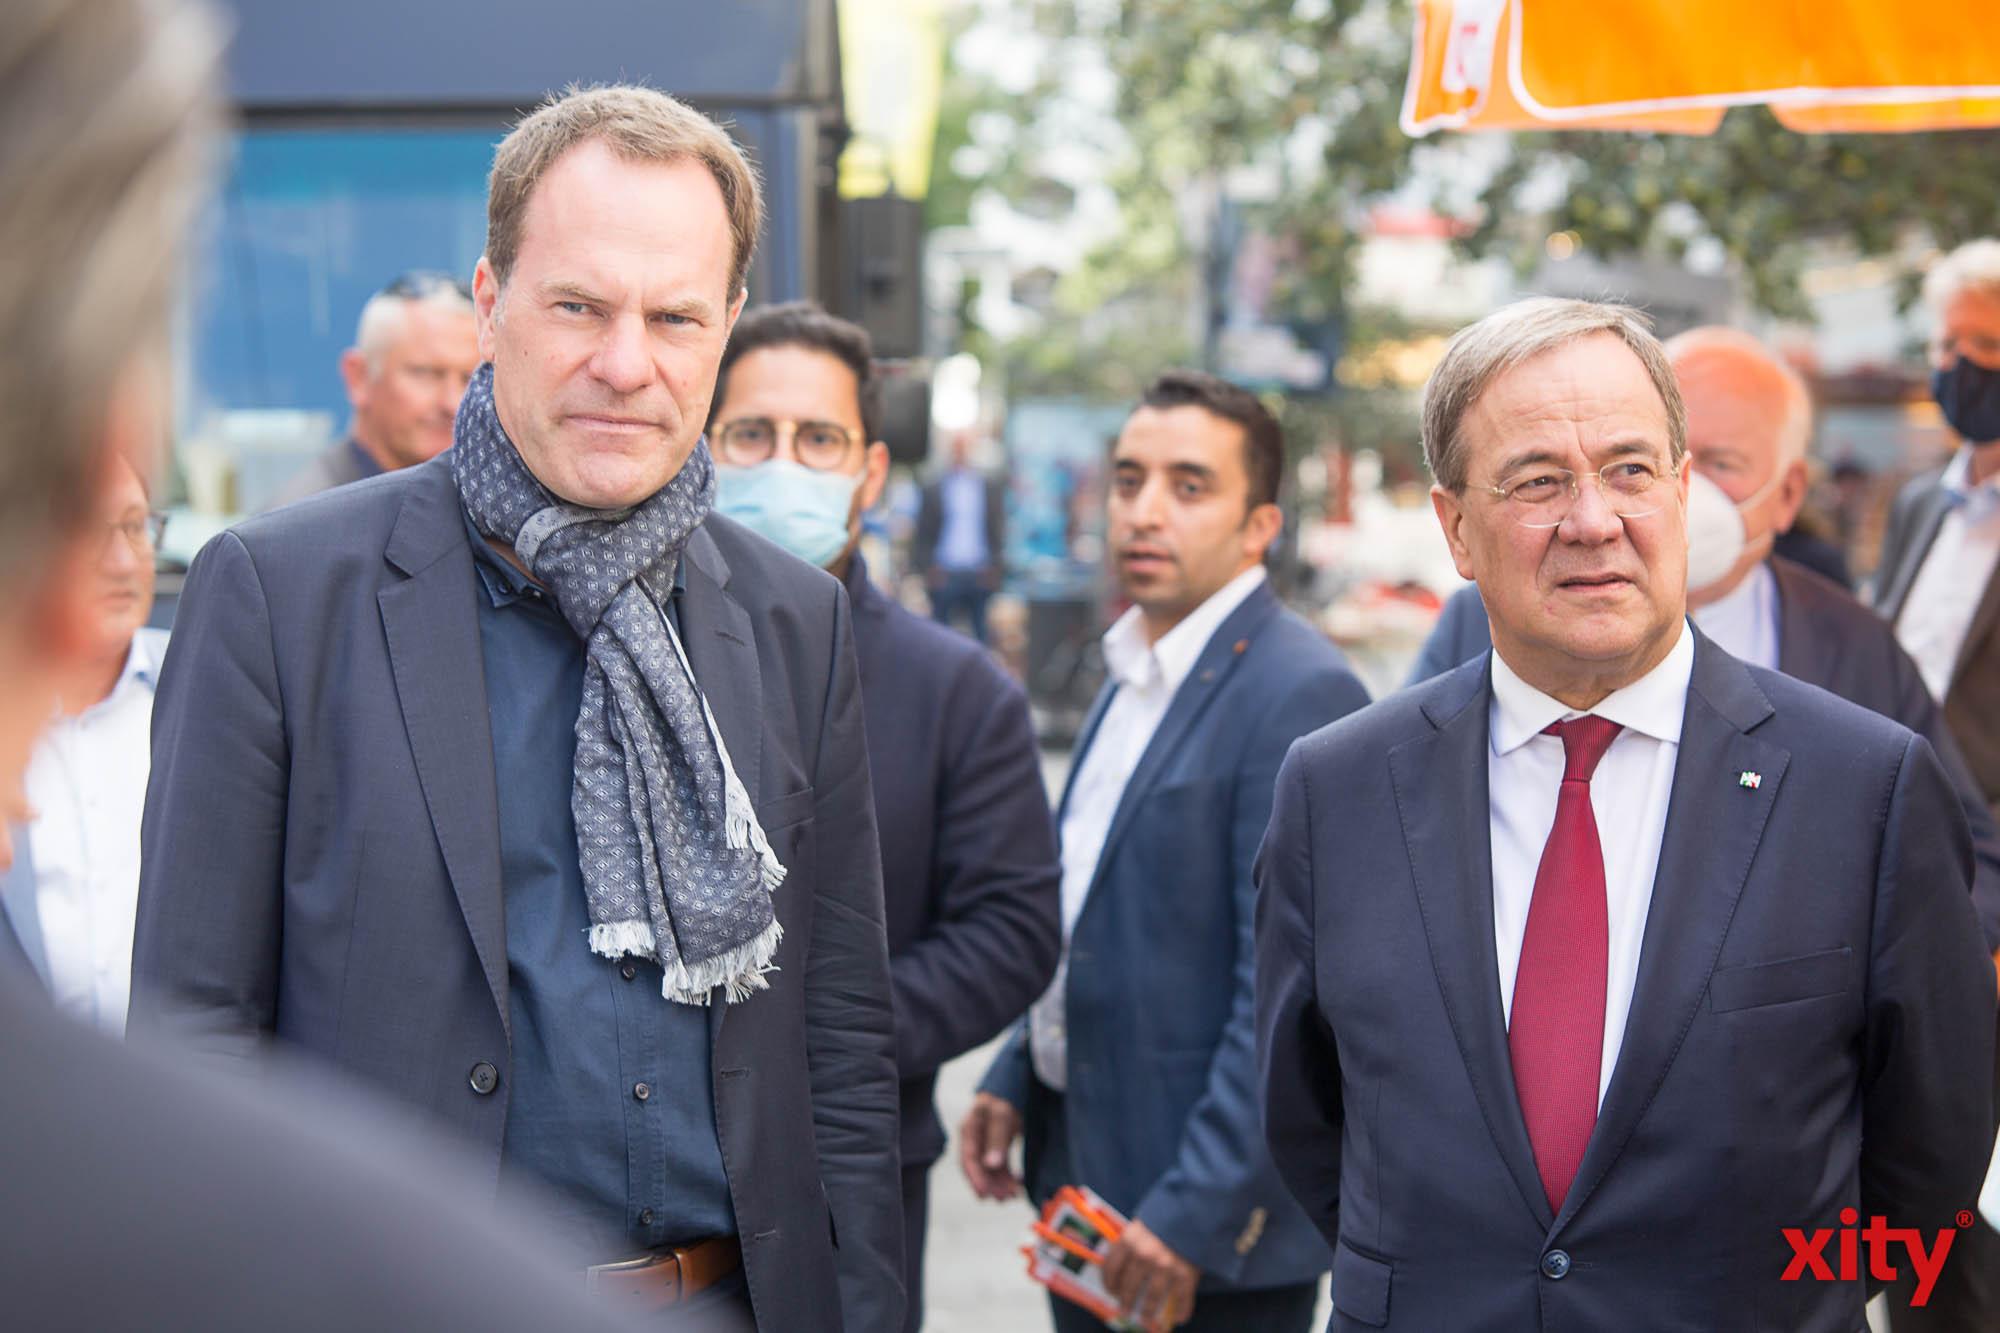 v.l.: Dr. Stephan Keller, Oberbürgermeisterkandidat der CDU Düsseldorf begrüßte Laschet an seinem Wahlstand (Foto: xity)